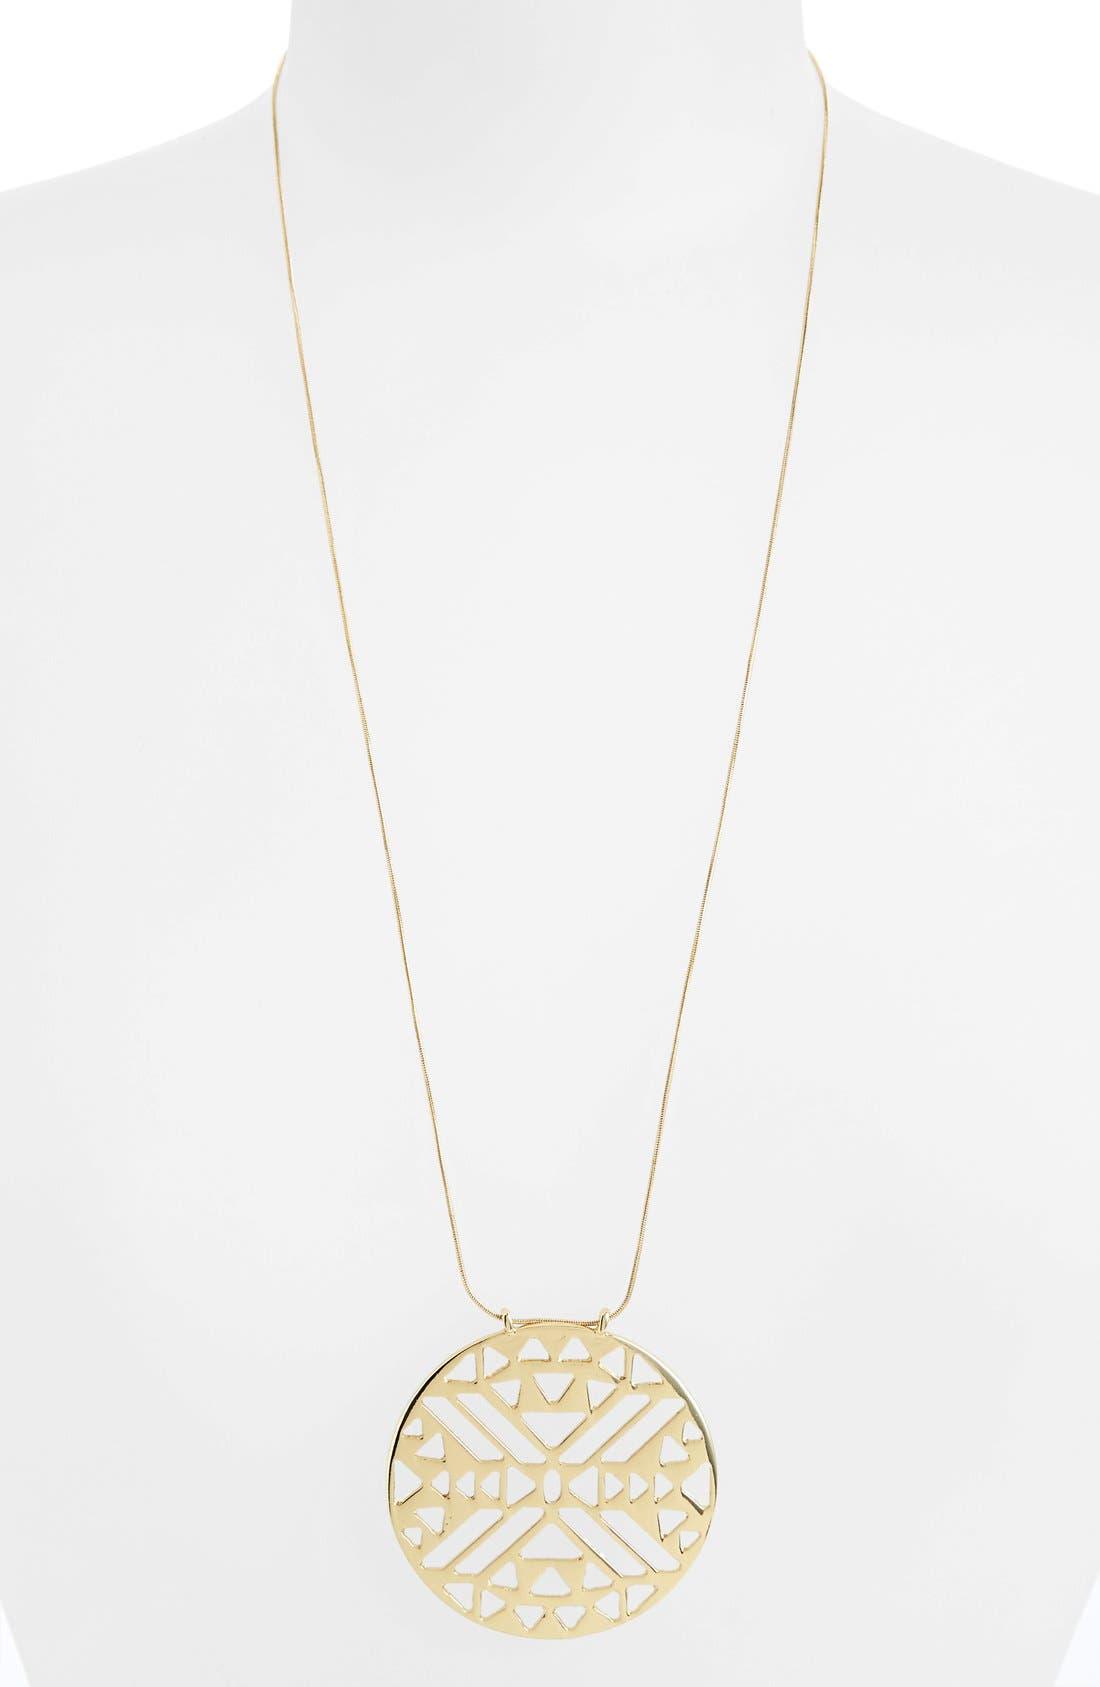 Alternate Image 1 Selected - Topshop 'Aztec' Cutout Circle Necklace